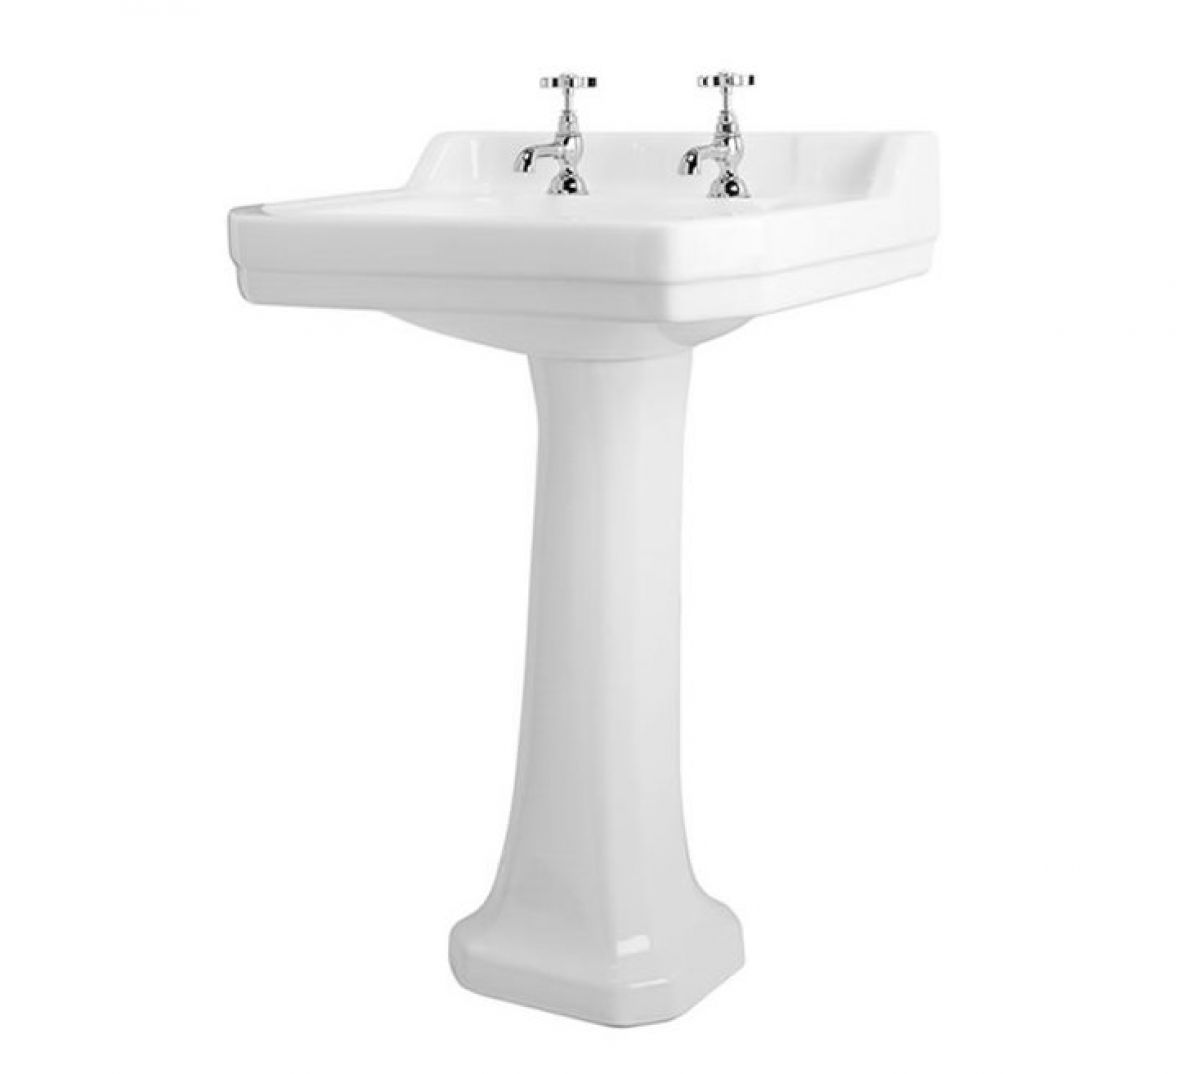 Traditional Bathroom Sinks Shires Waverley Edwardian 56cm Basin Tinagroo Pedestal Sinks